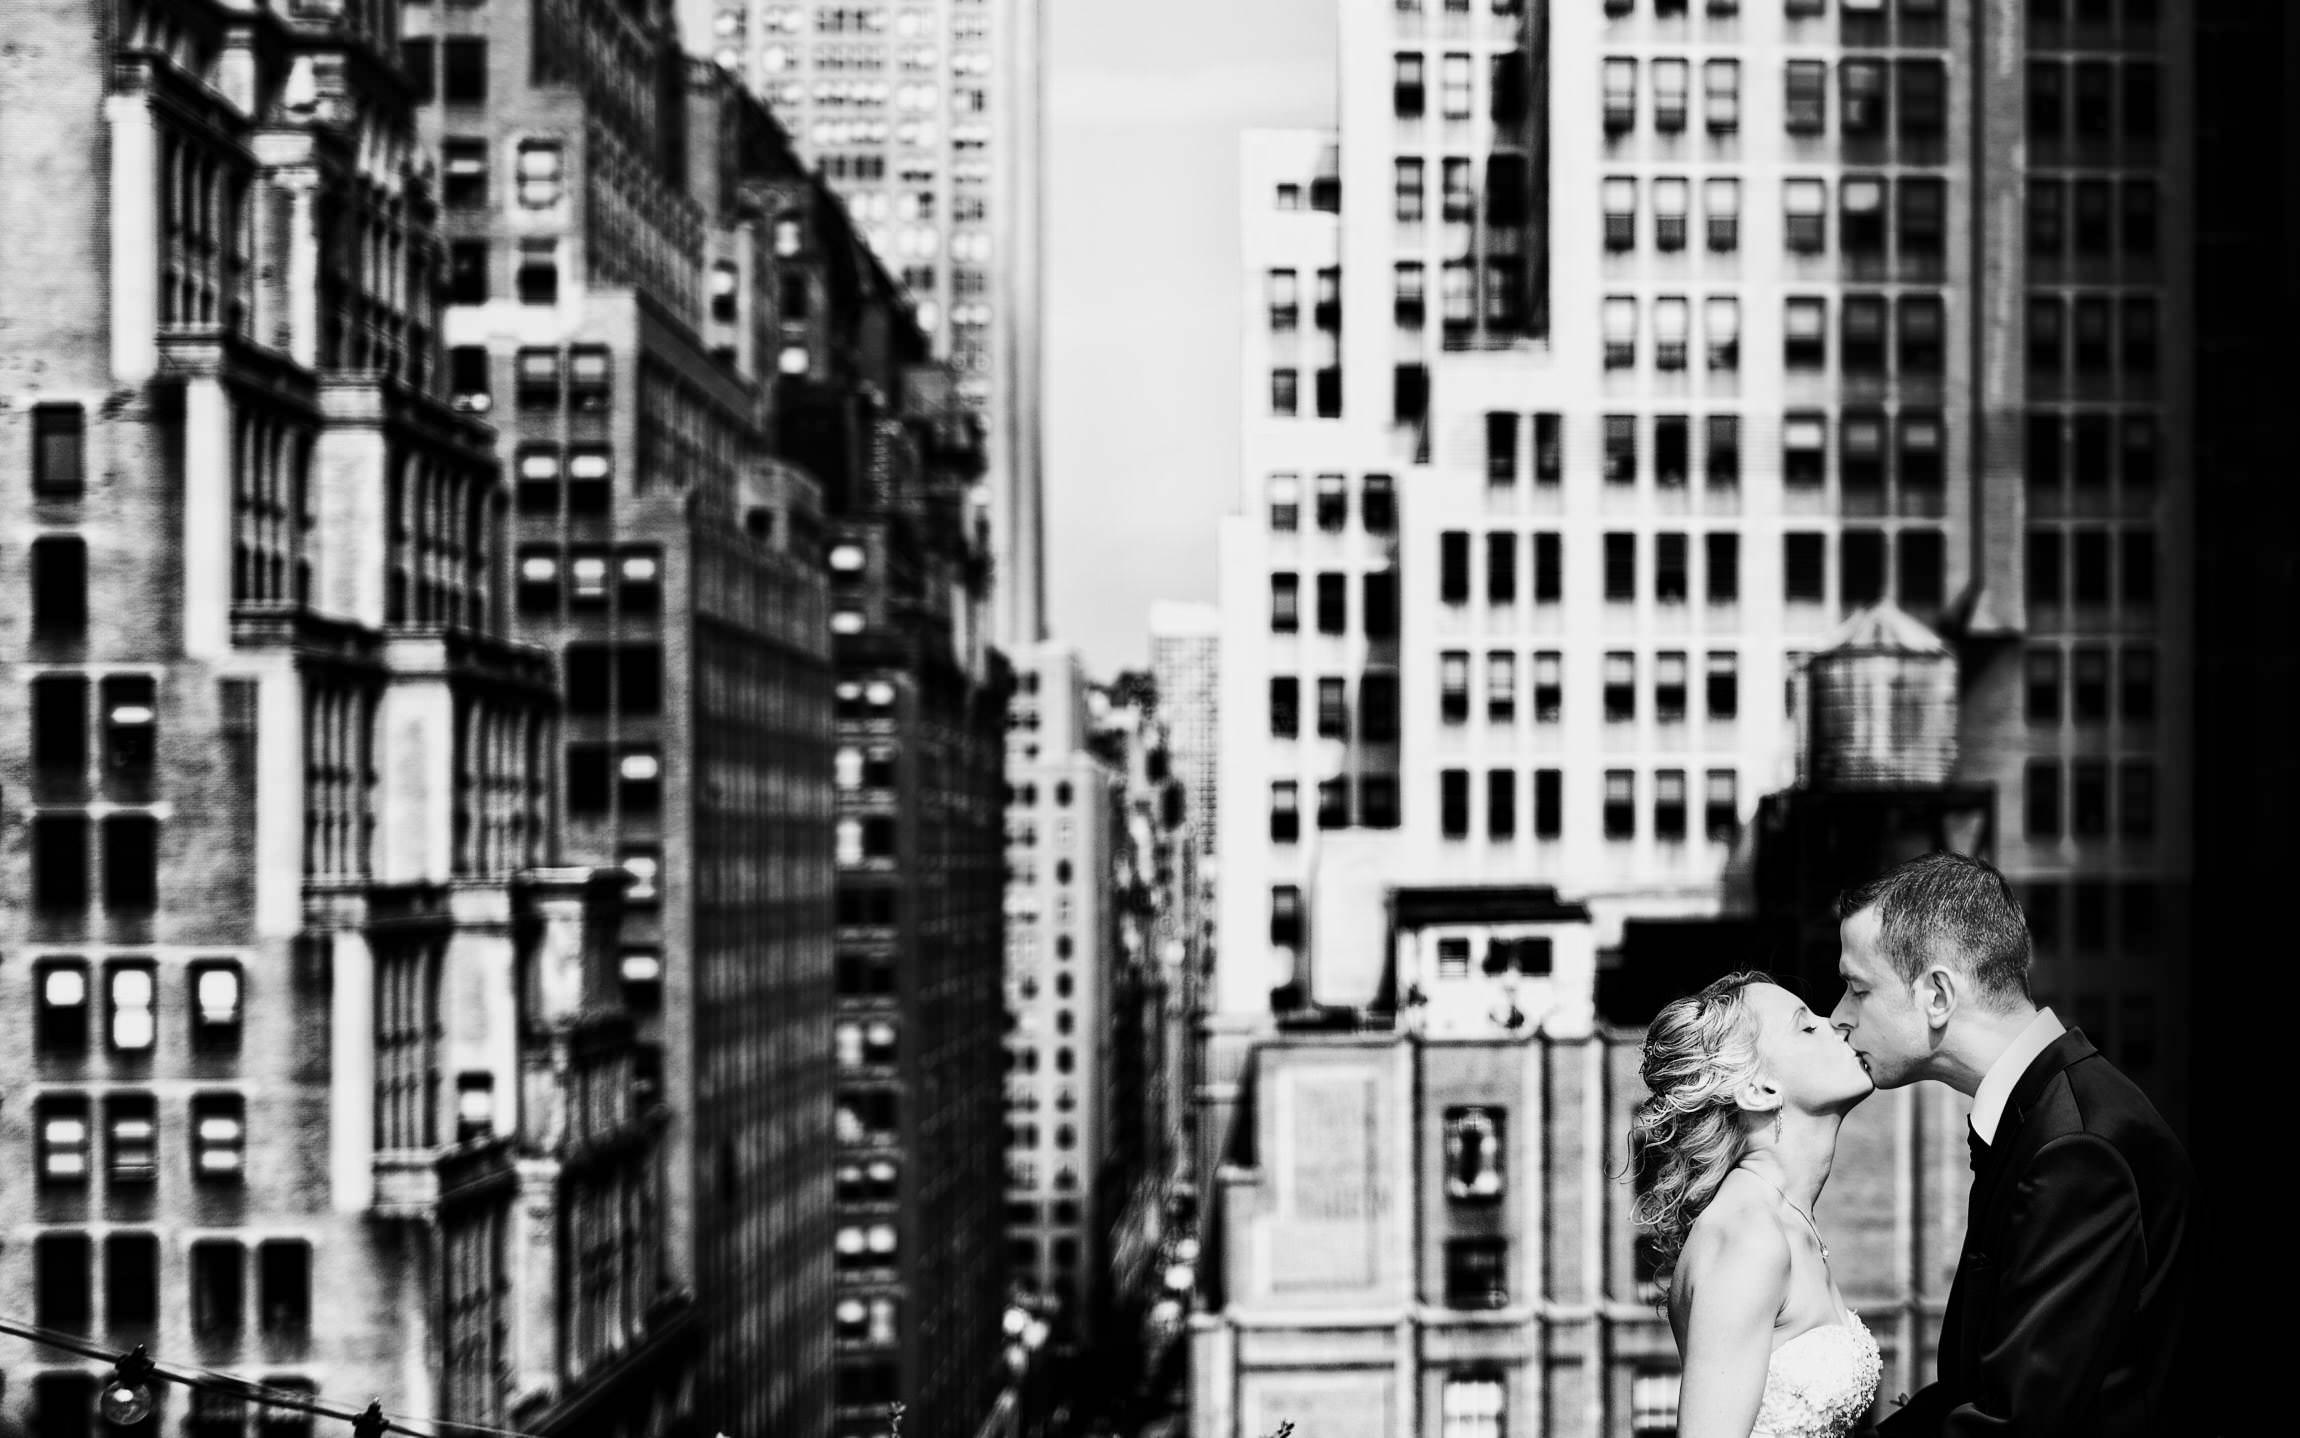 hochzeitsfotograf nyc